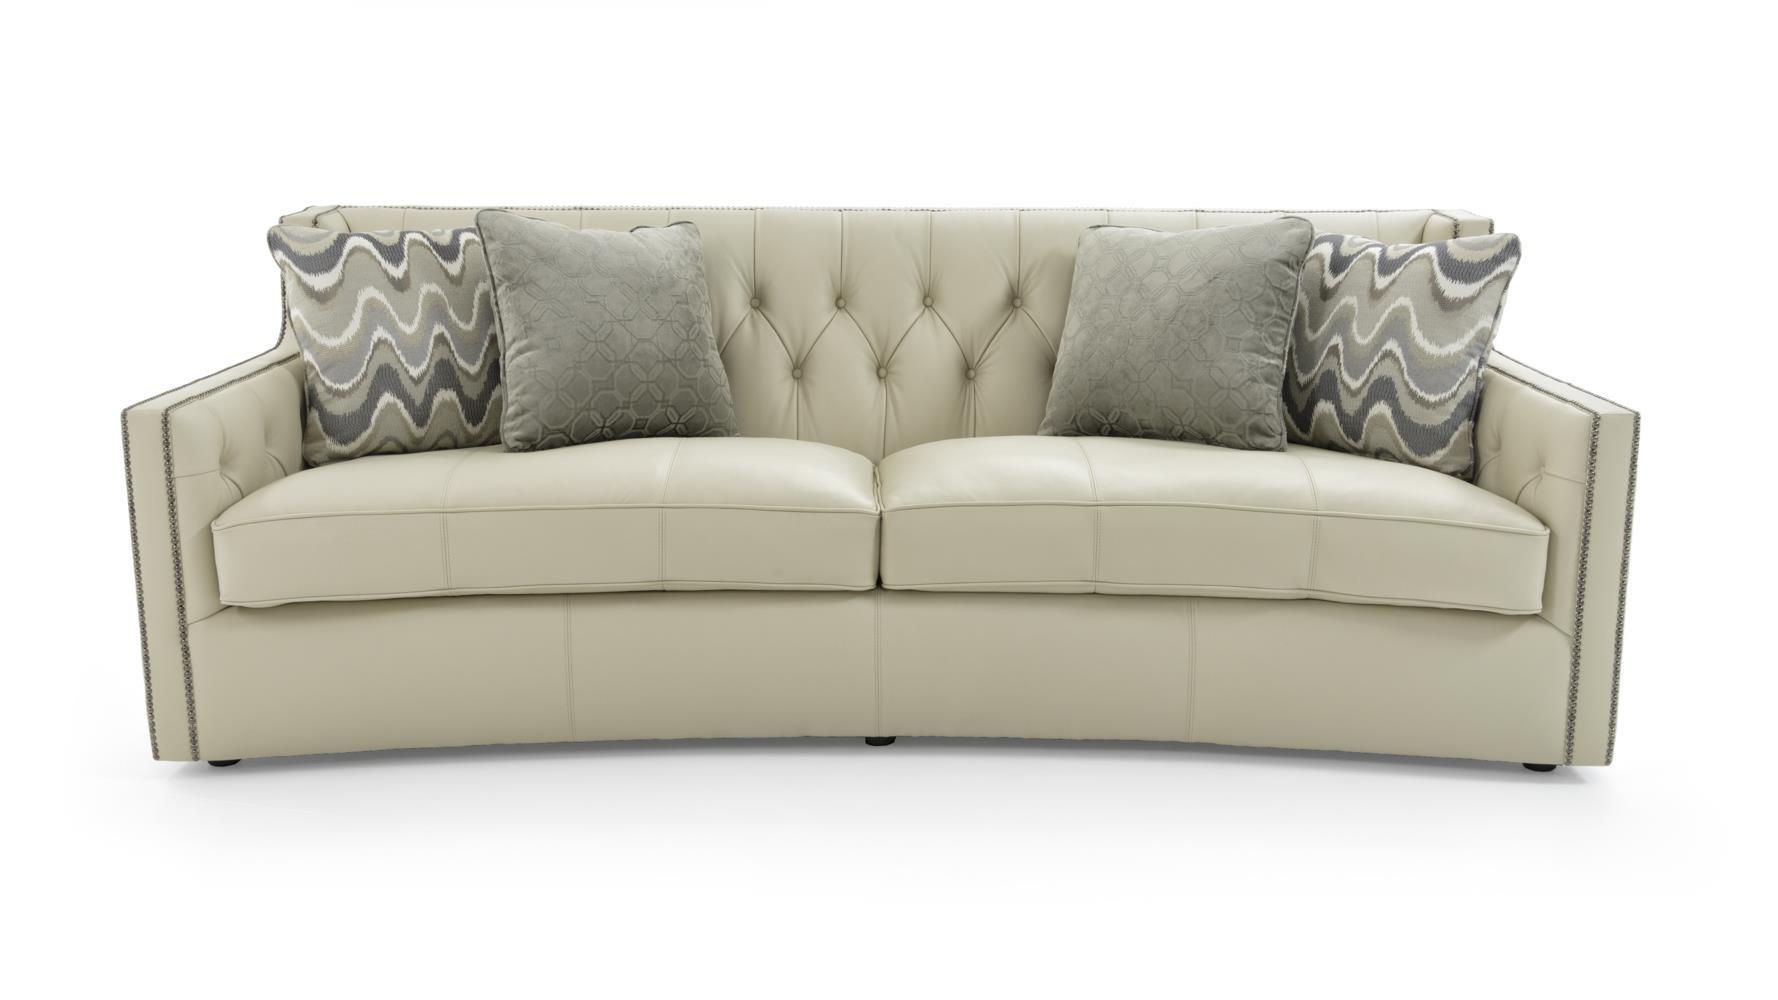 bernhardt breckenridge sofa na olx es elegance mantelli 1926 thesofa